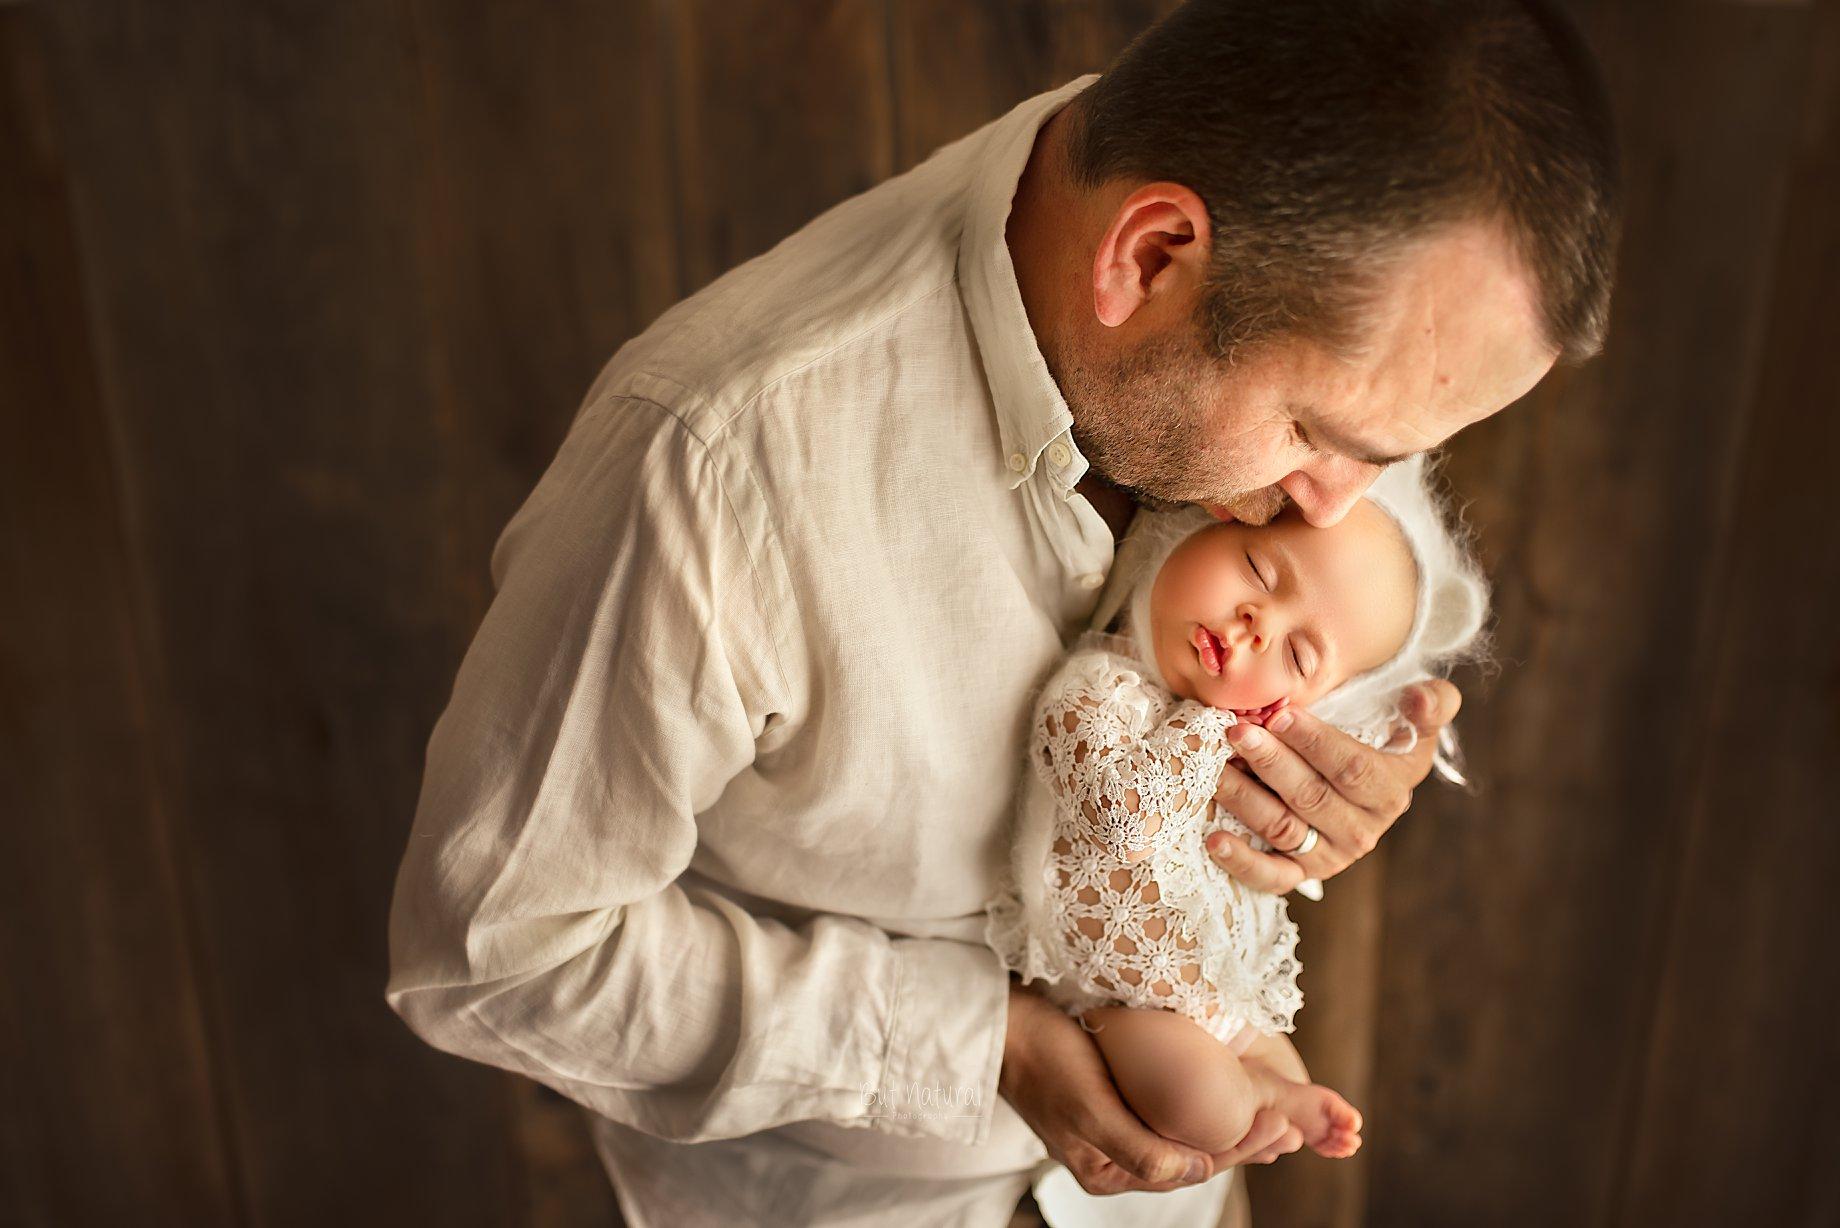 Dad with his newborn baby | Sujata Setia - Newborn photographer | But Natural Photography